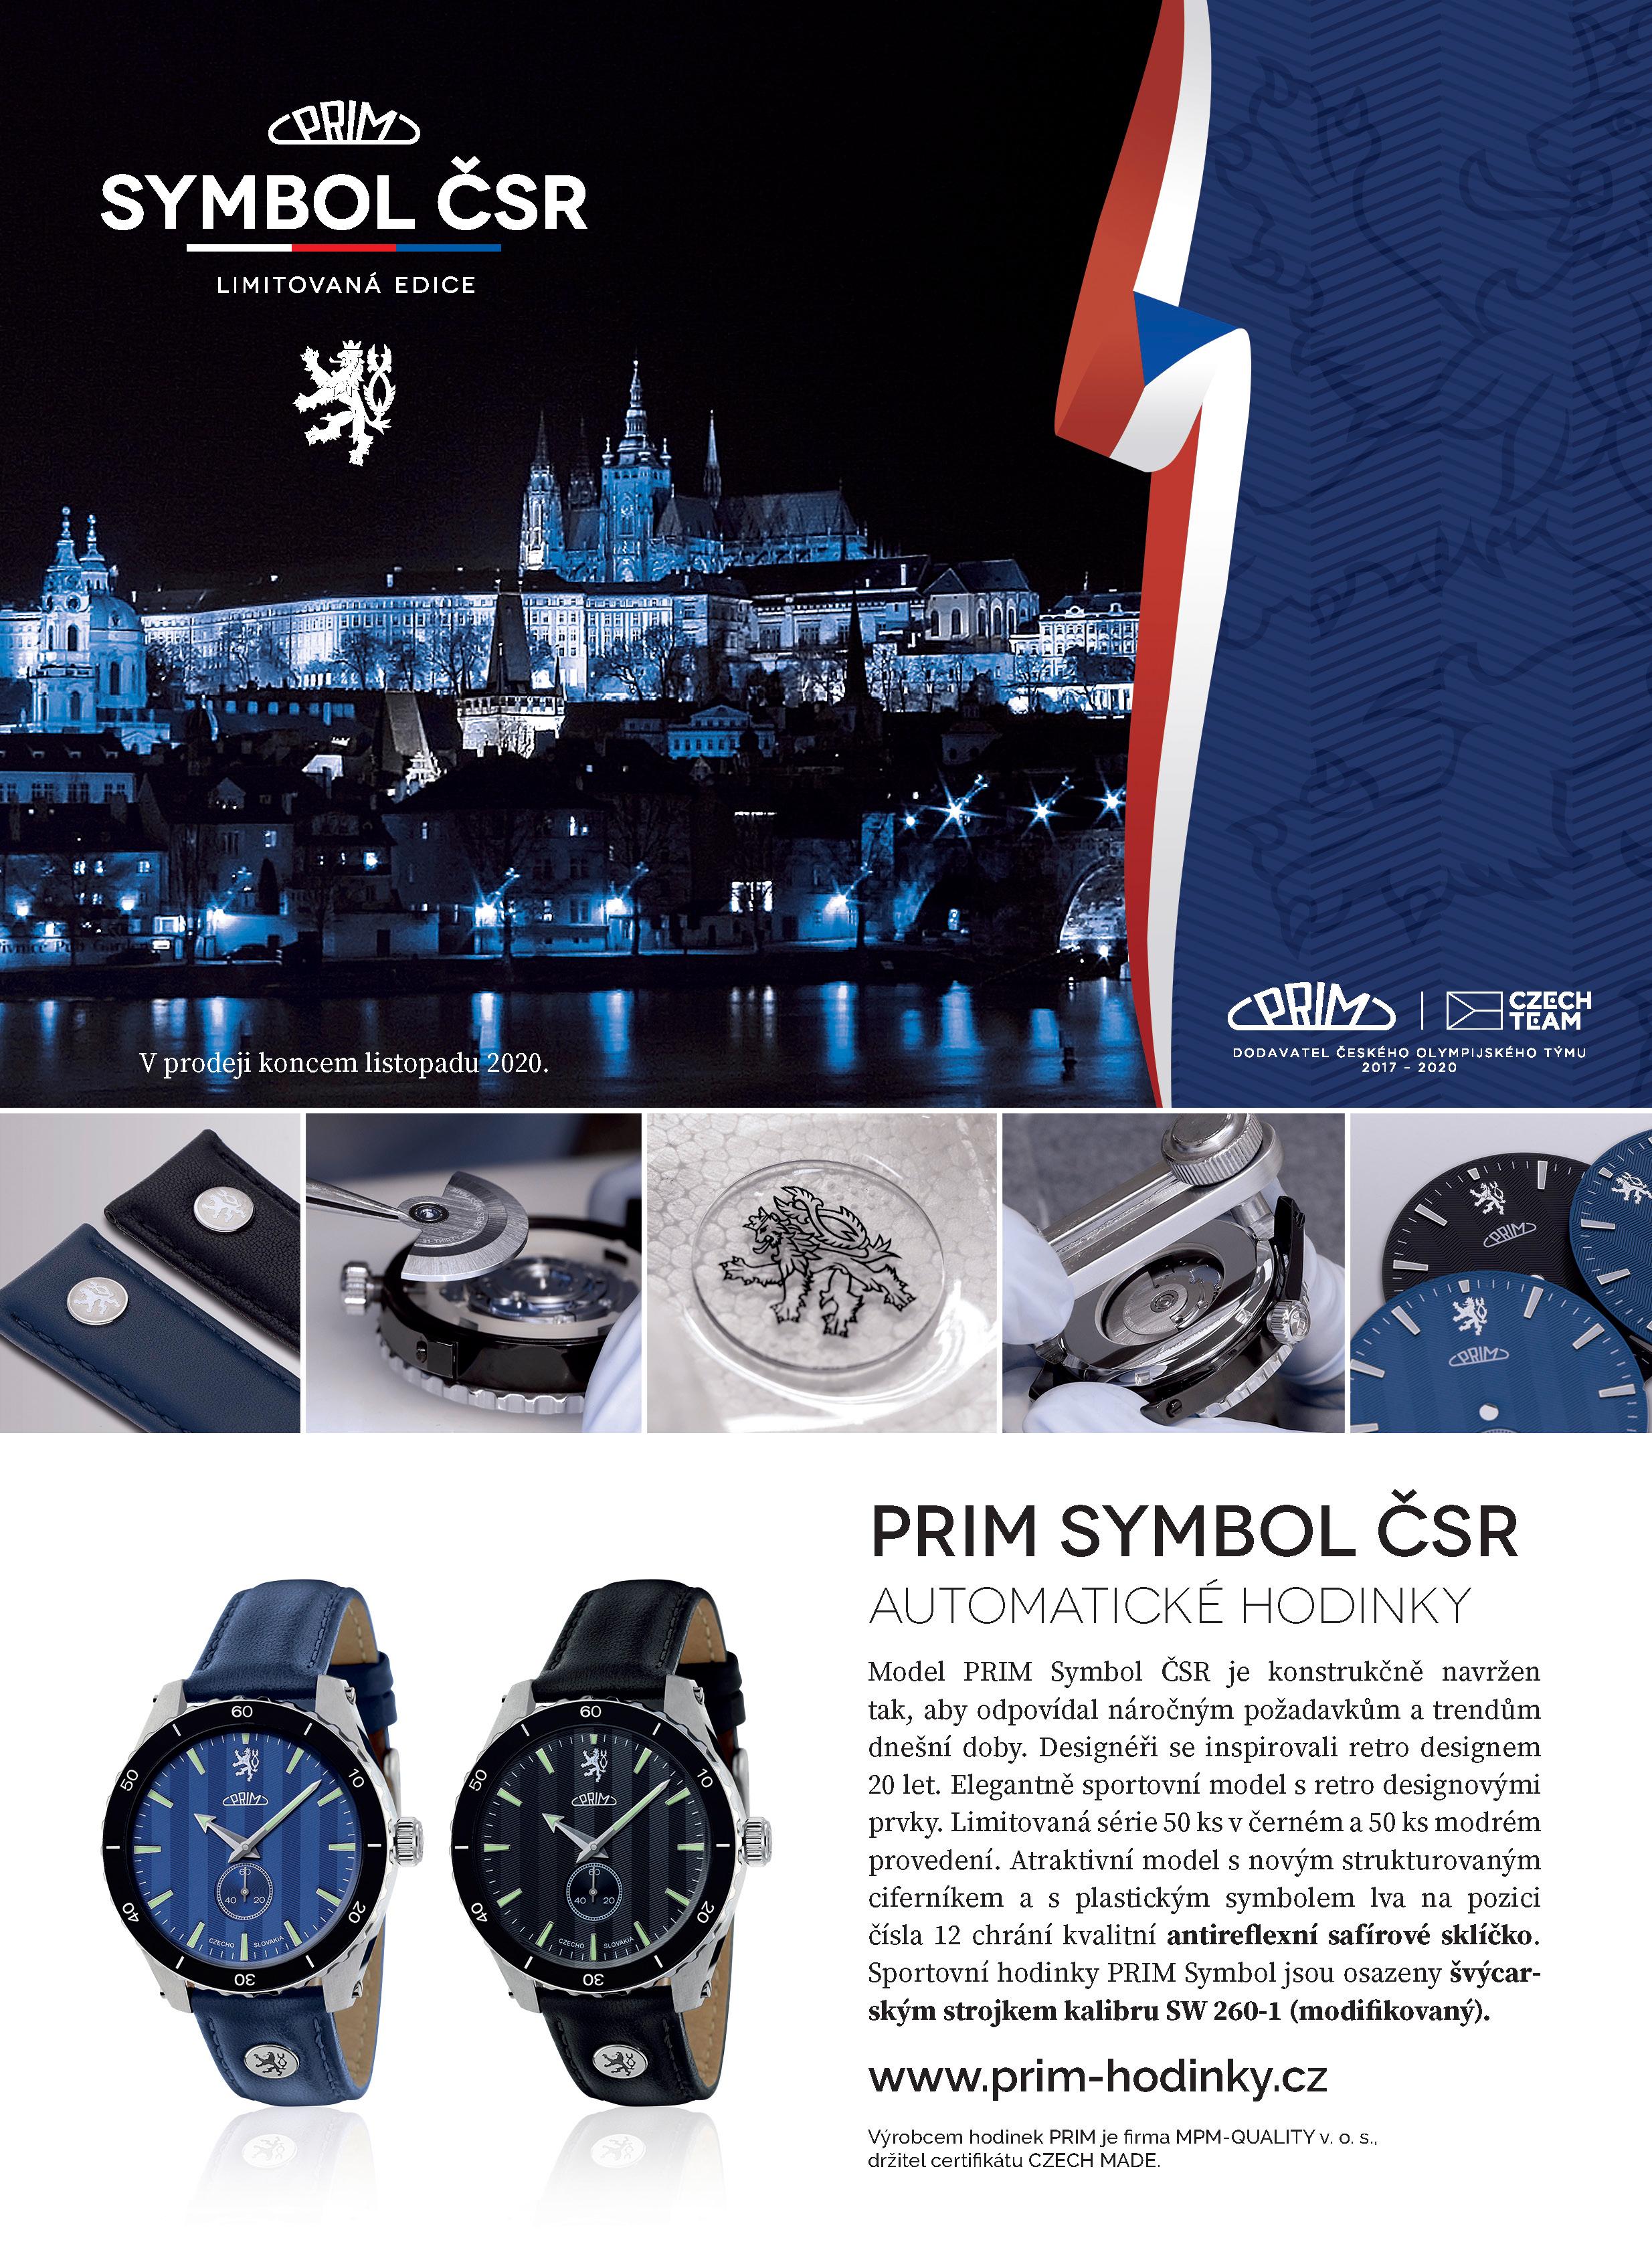 HS_PRIM-SYMBOL-CSR-2020_210x285mm.jpg